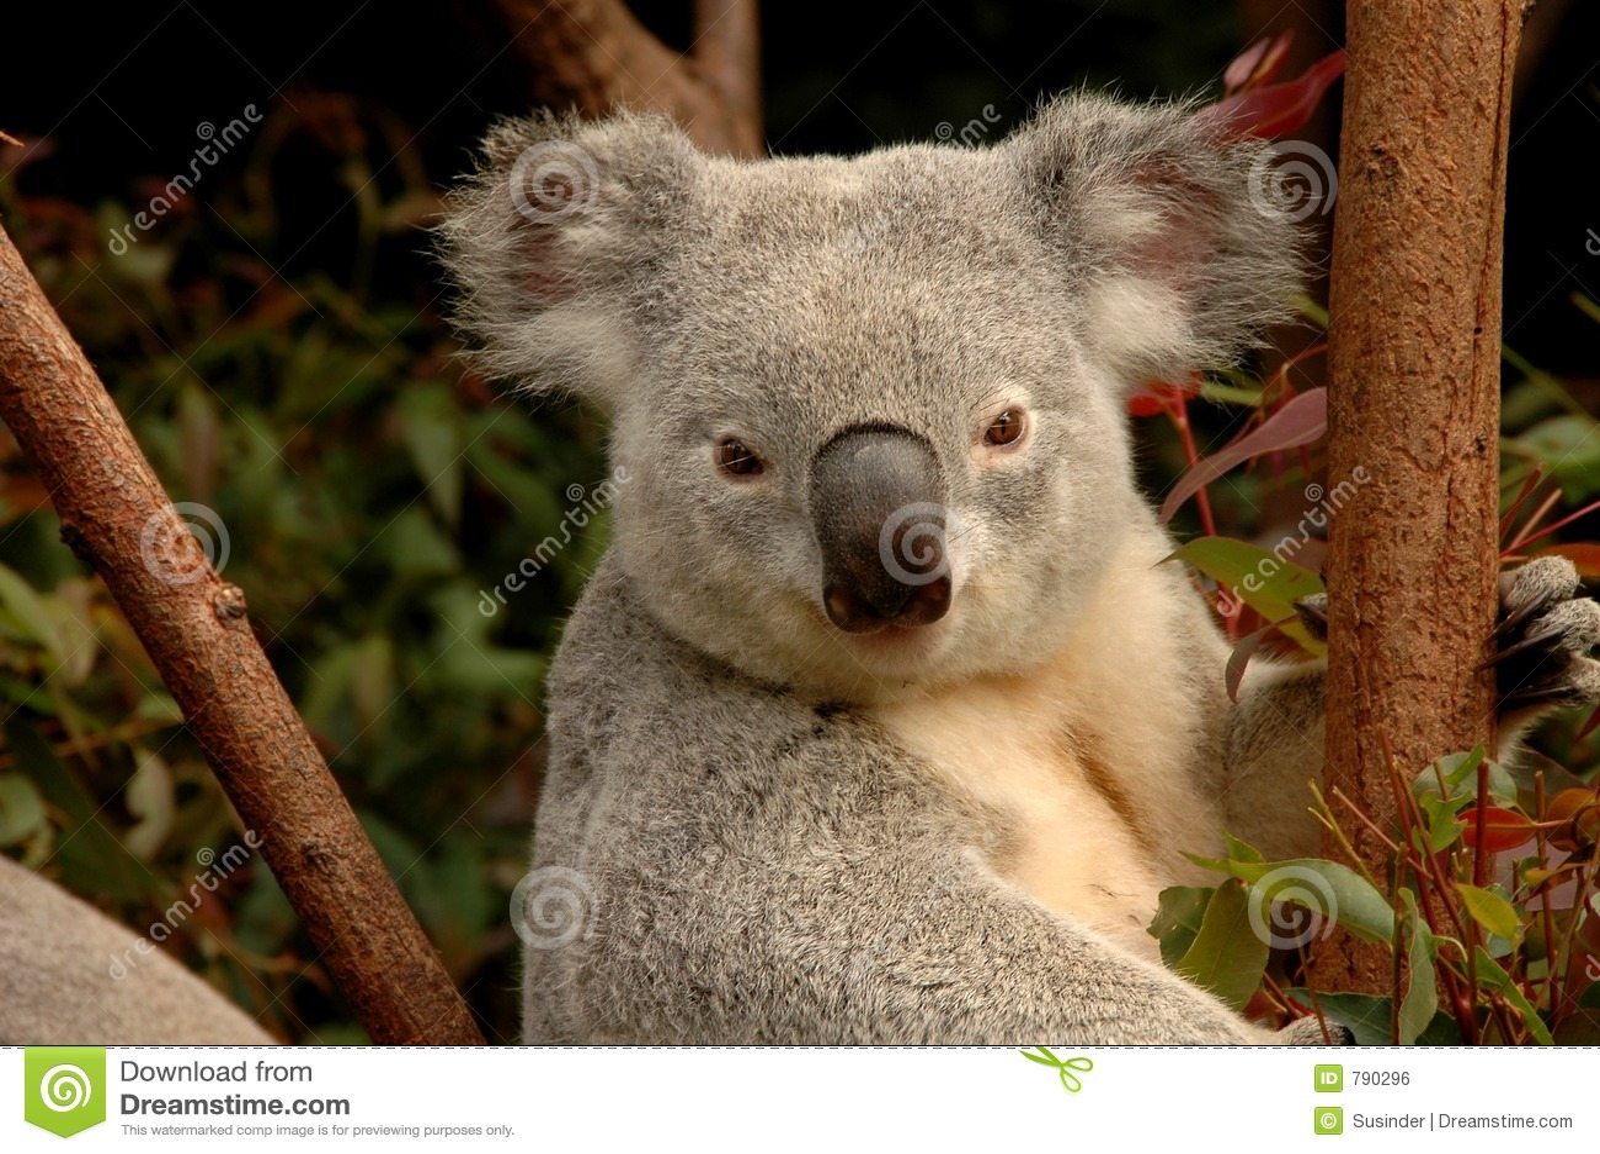 Alert Koala Bear